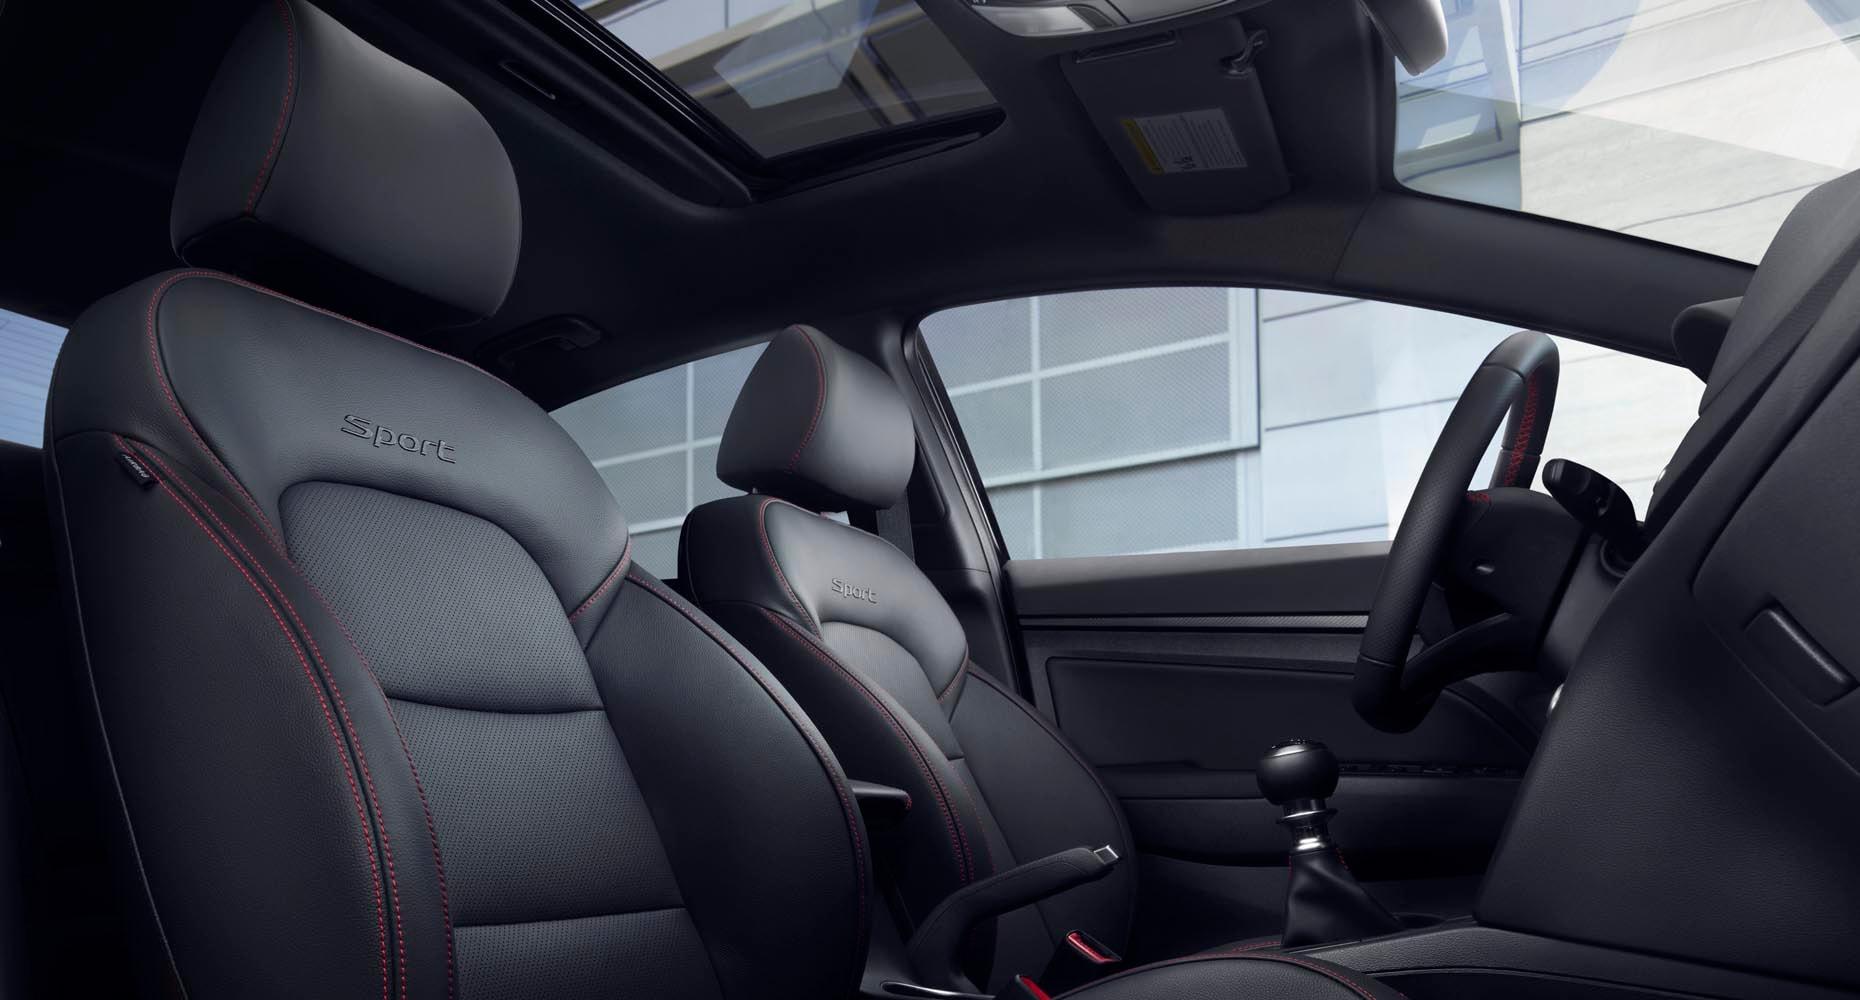 Hyundai Elantra: Seat belt restraint system